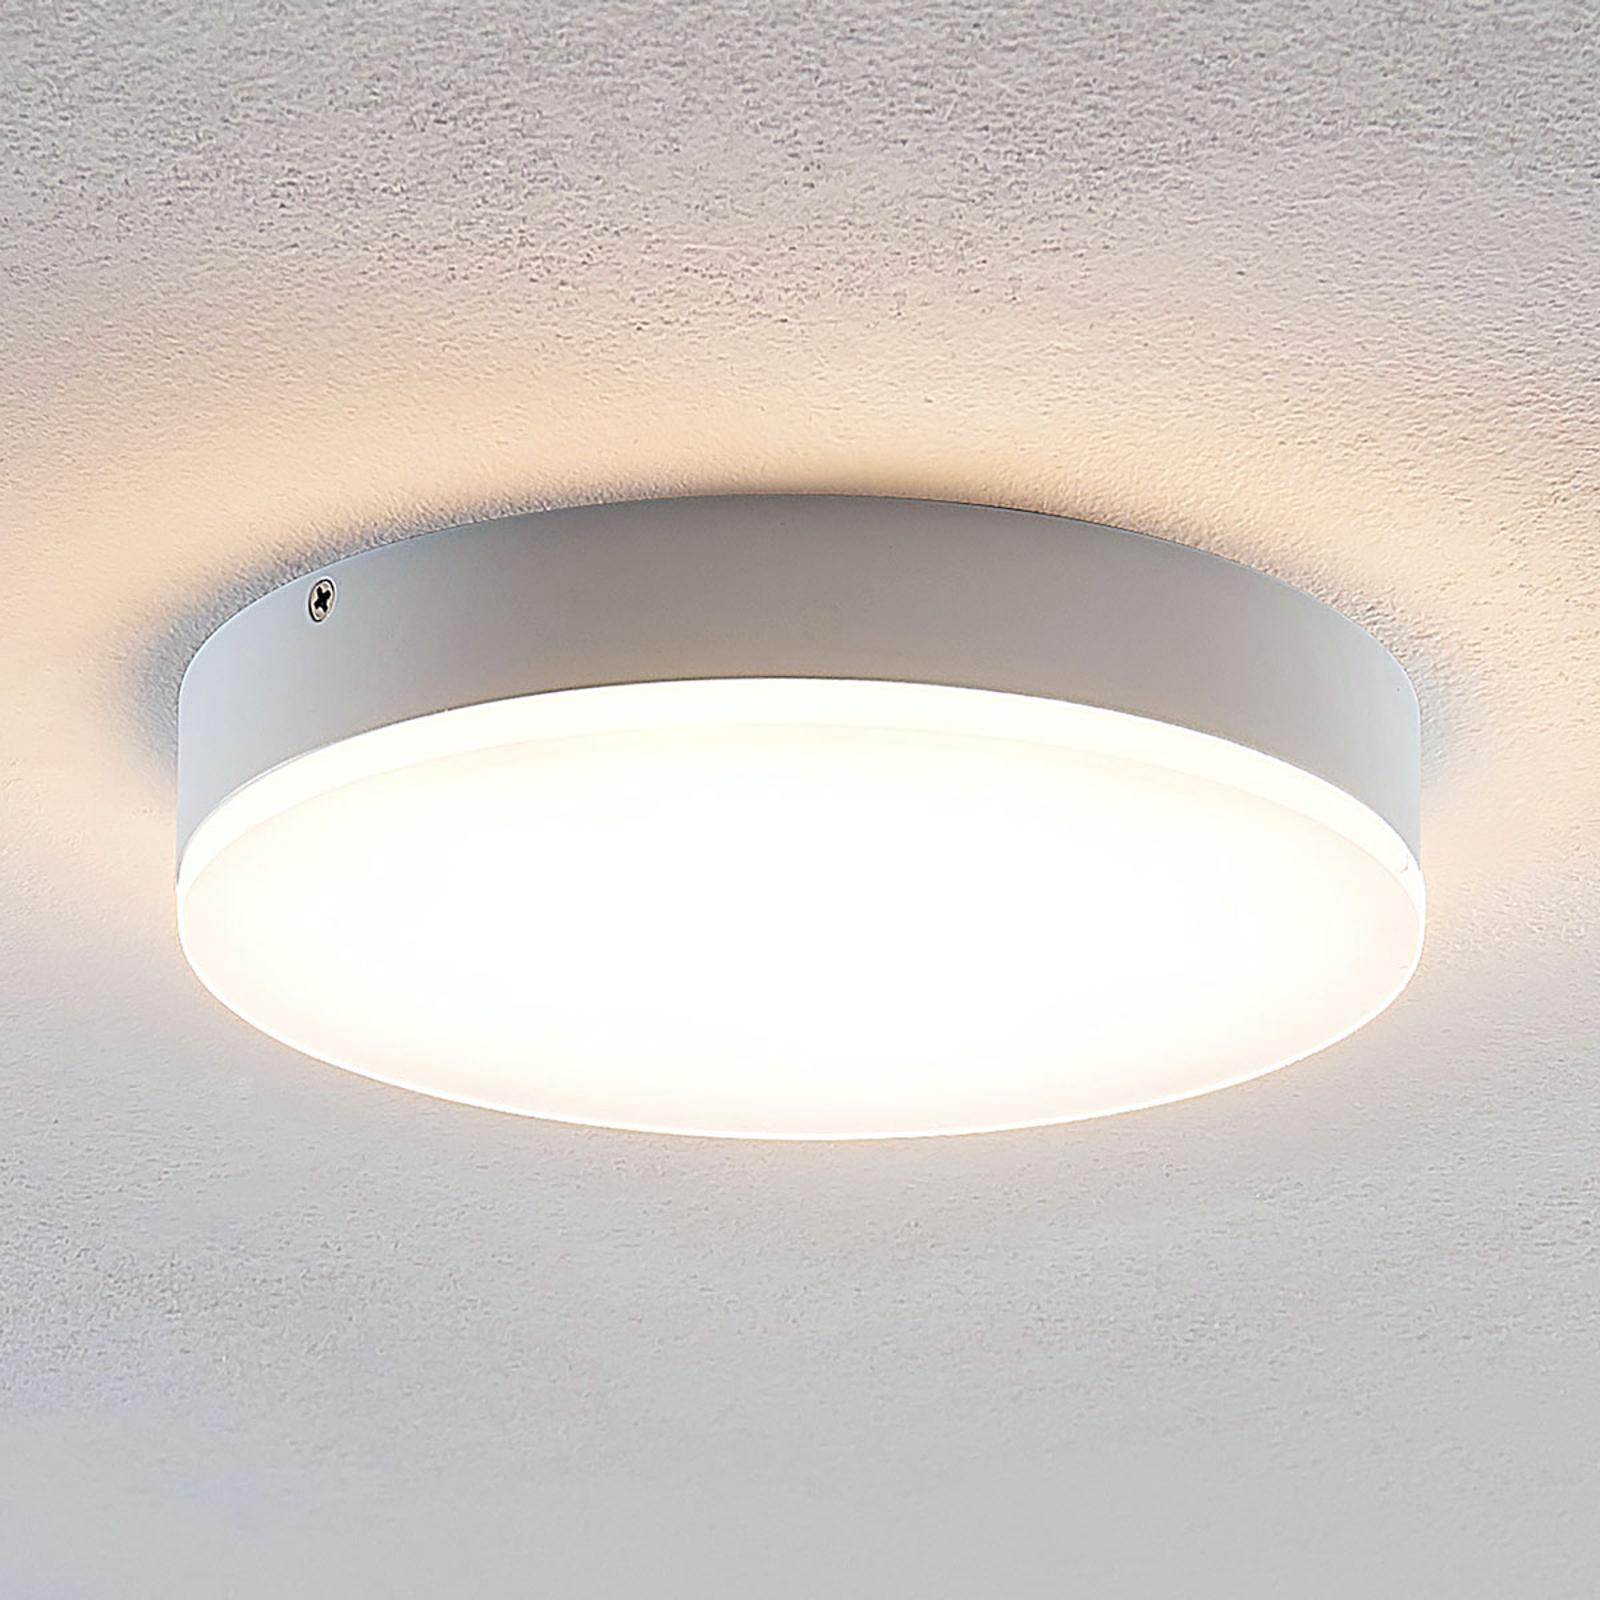 Lindby Leonta LED-taklampe, hvit, Ø 20 cm